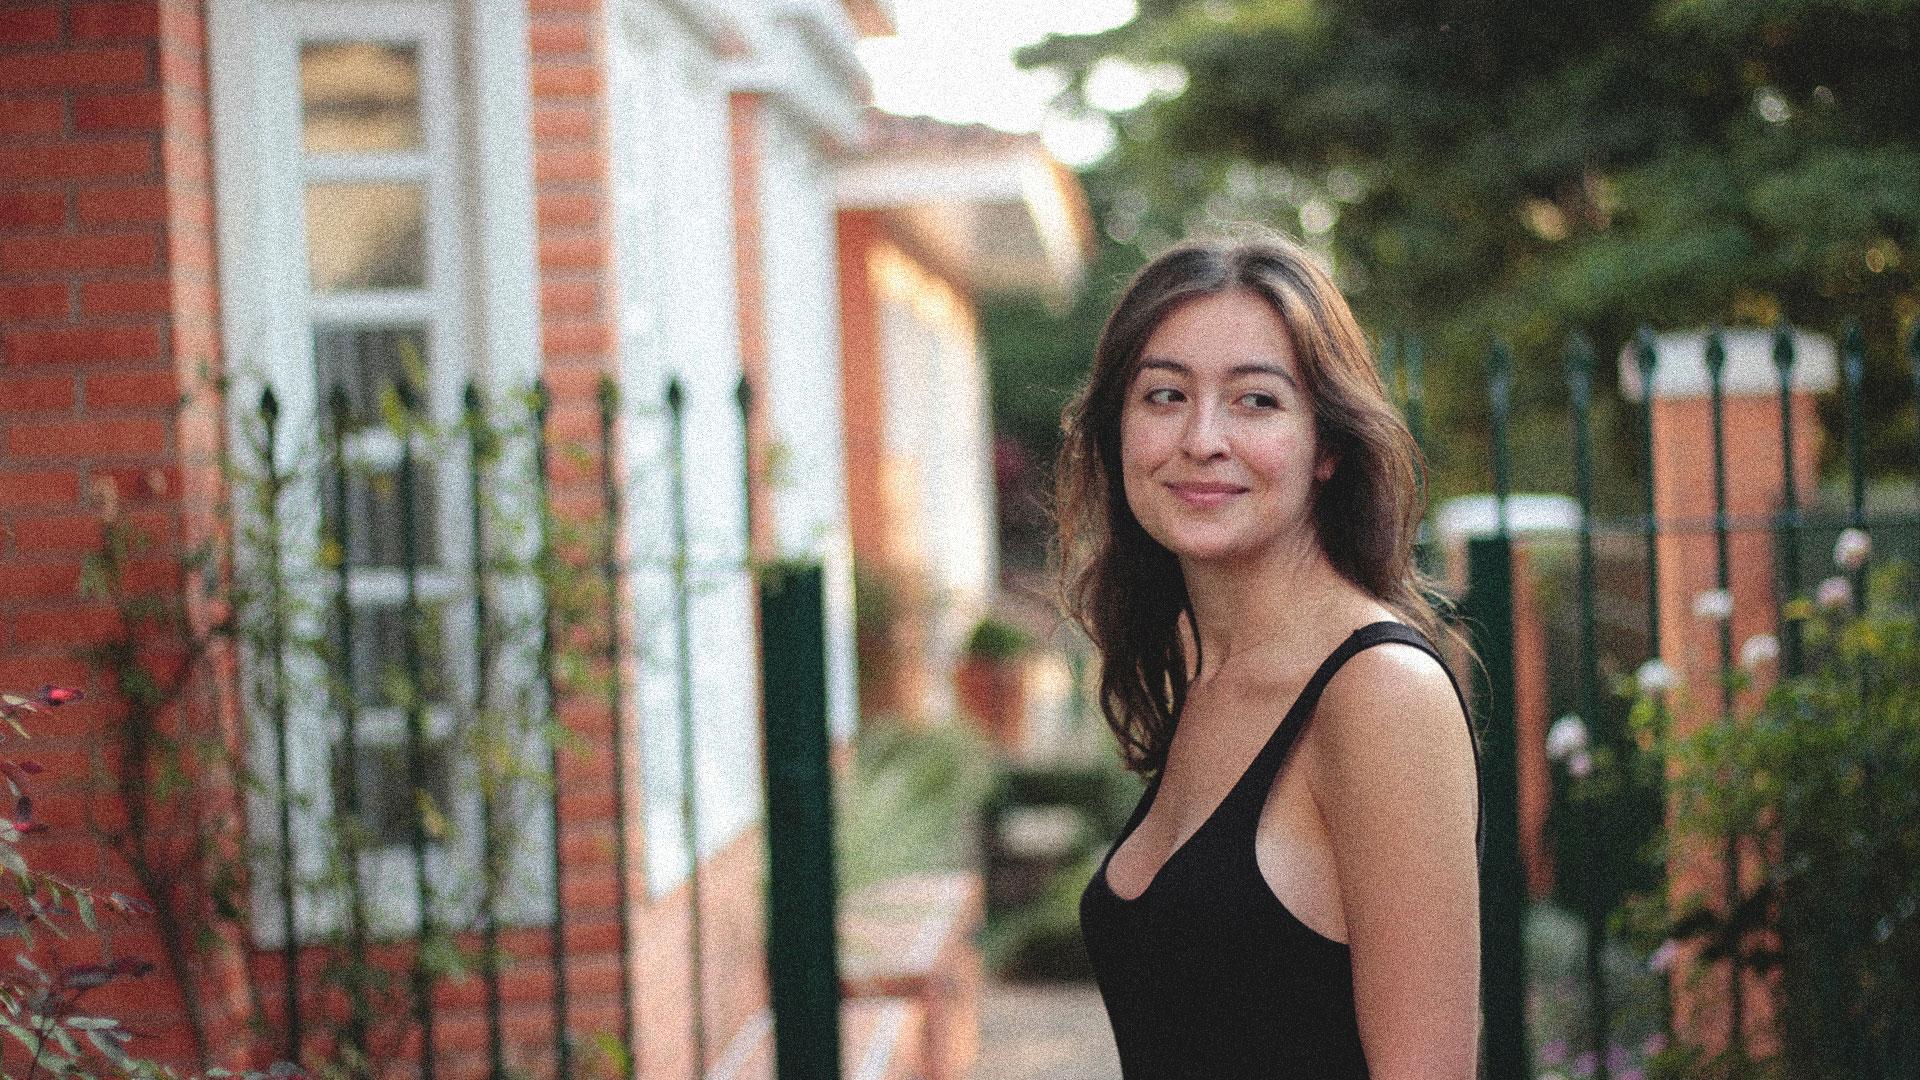 Veronica Motti, the client